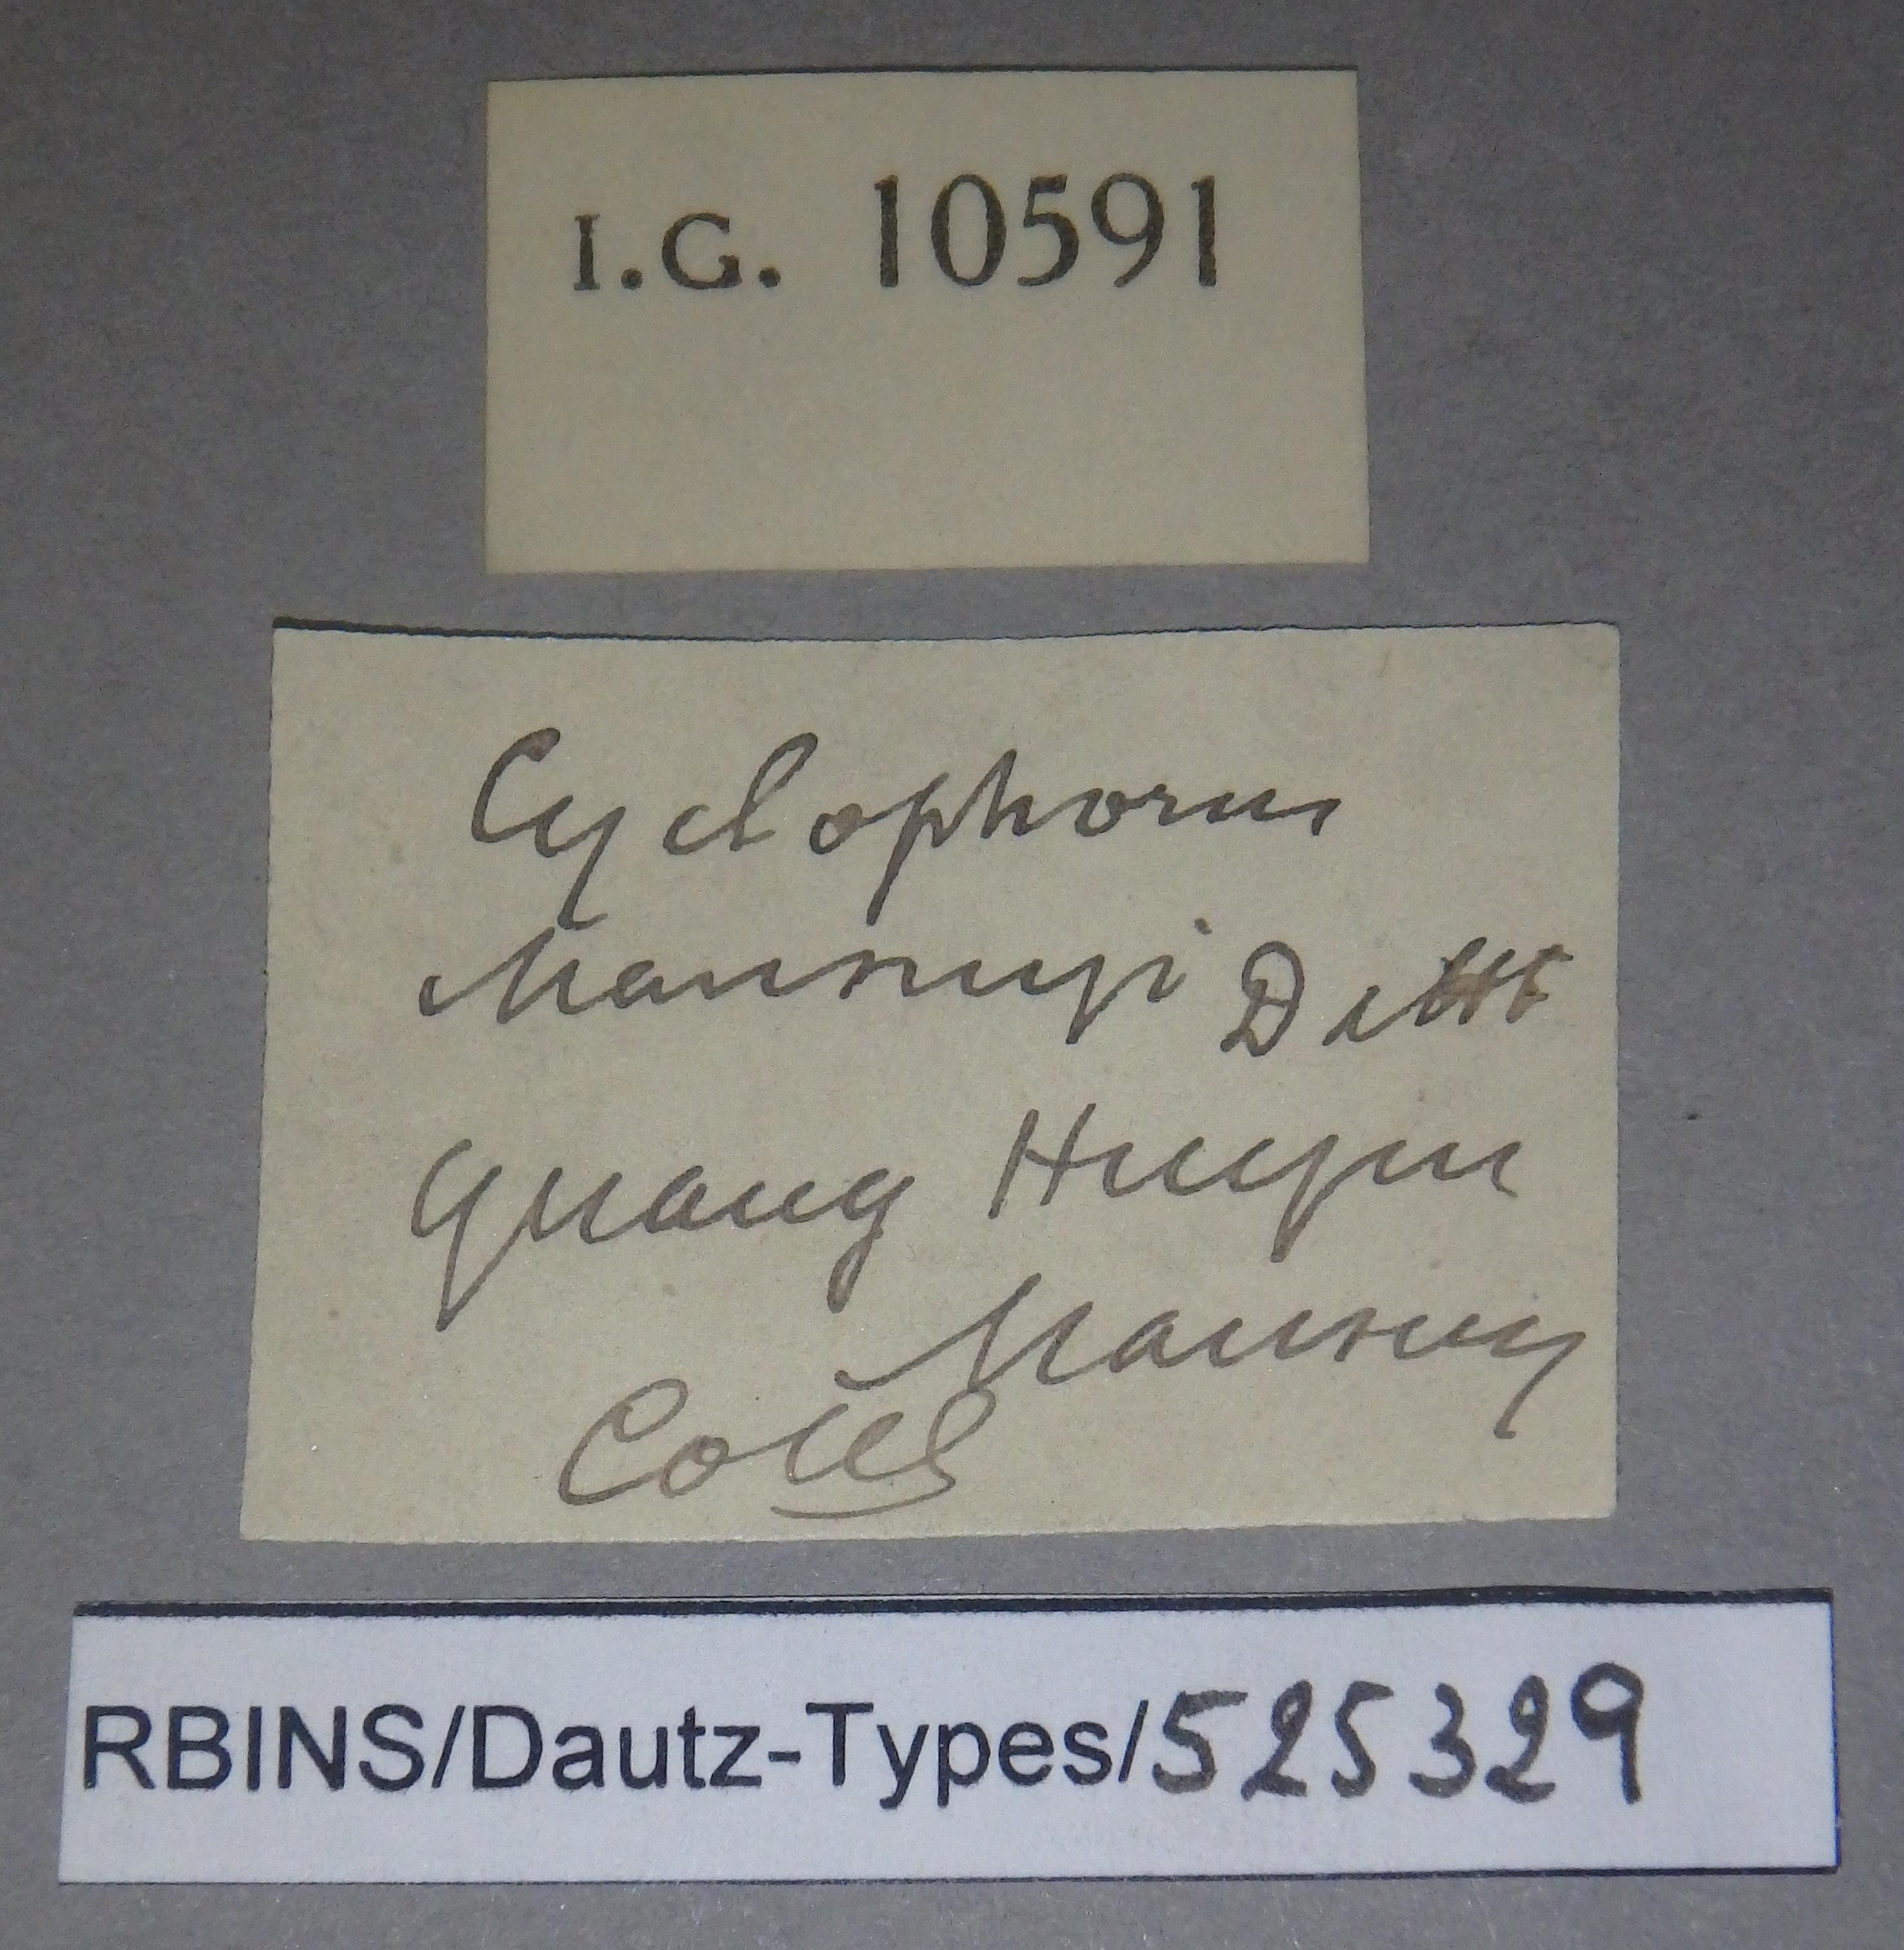 BE-RBINS-INV PARATYPE MT 908 Cyclophorus mansuyi LABELS.jpg